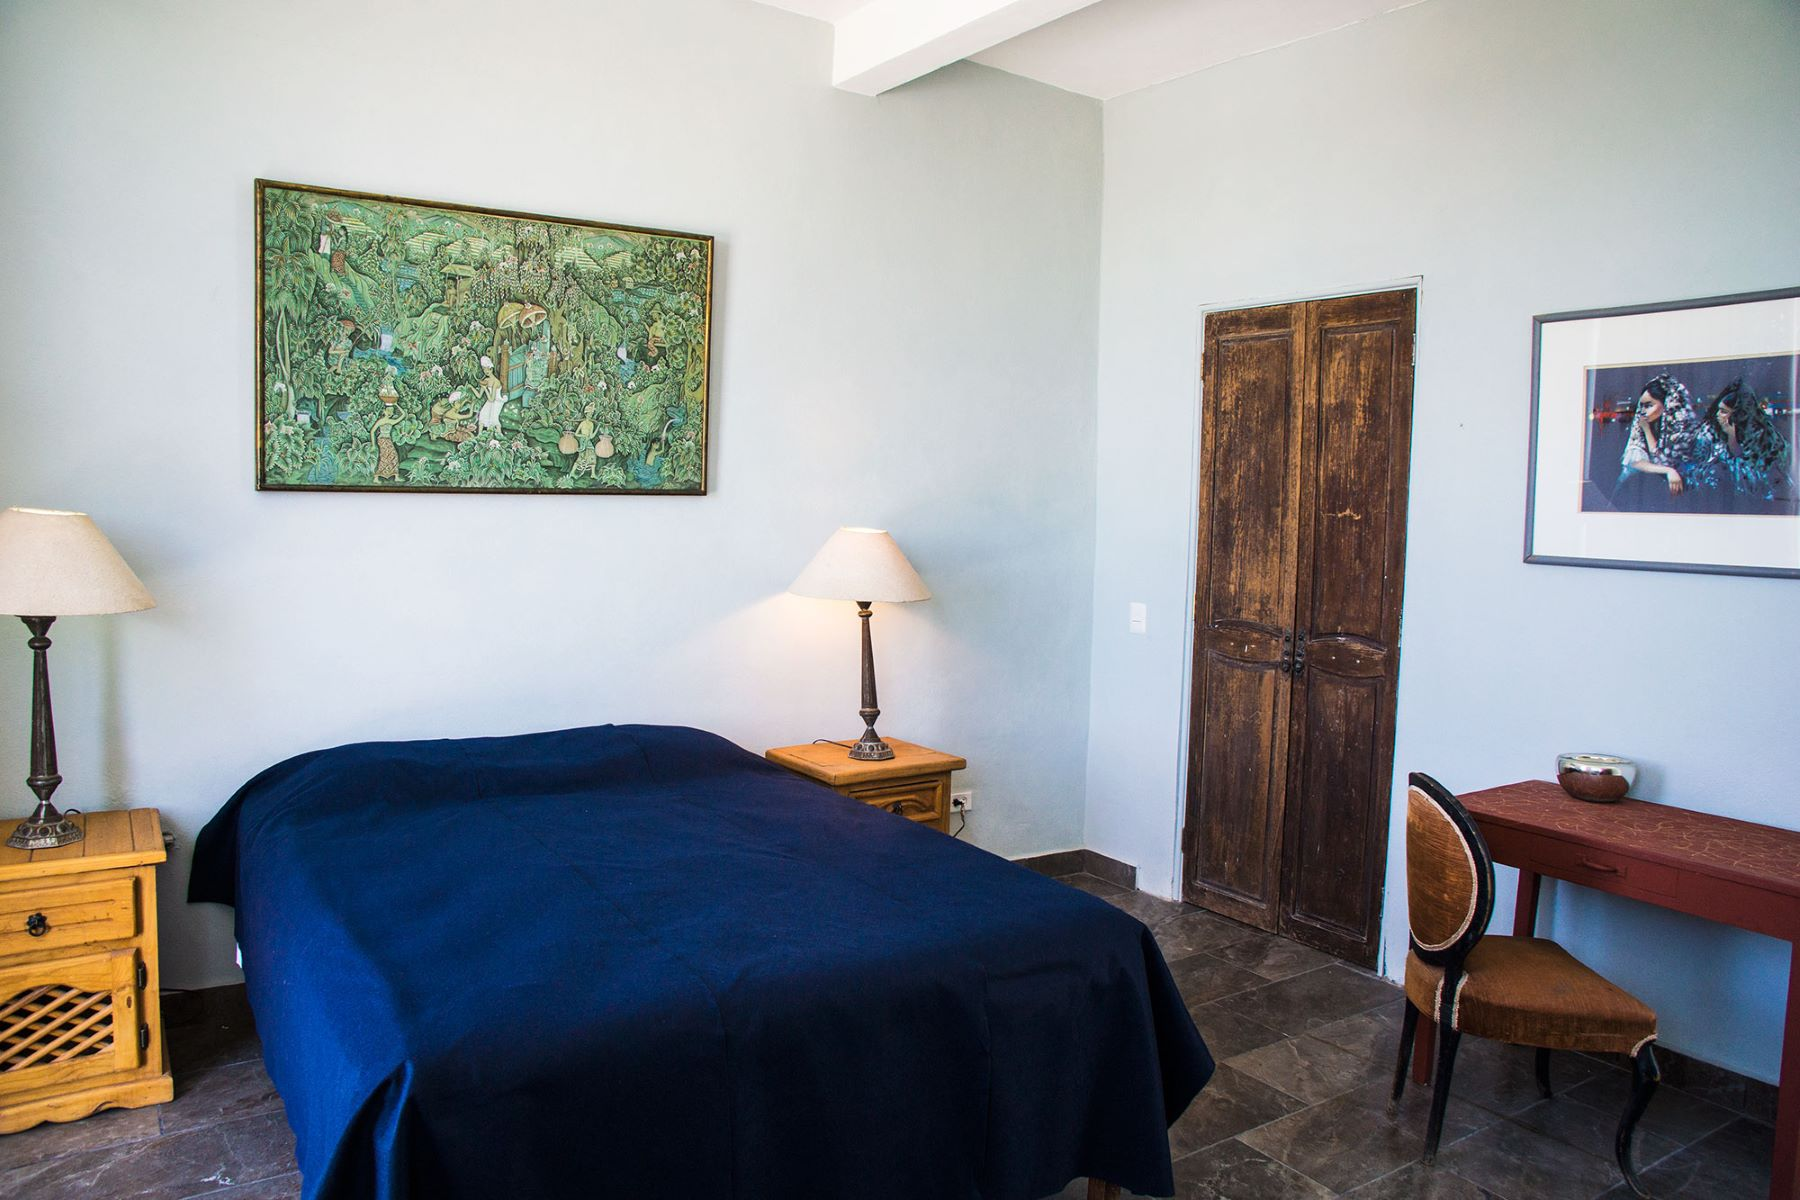 Additional photo for property listing at CERES Ceres 46 San Miguel De Allende, Guanajuato 37736 Mexico